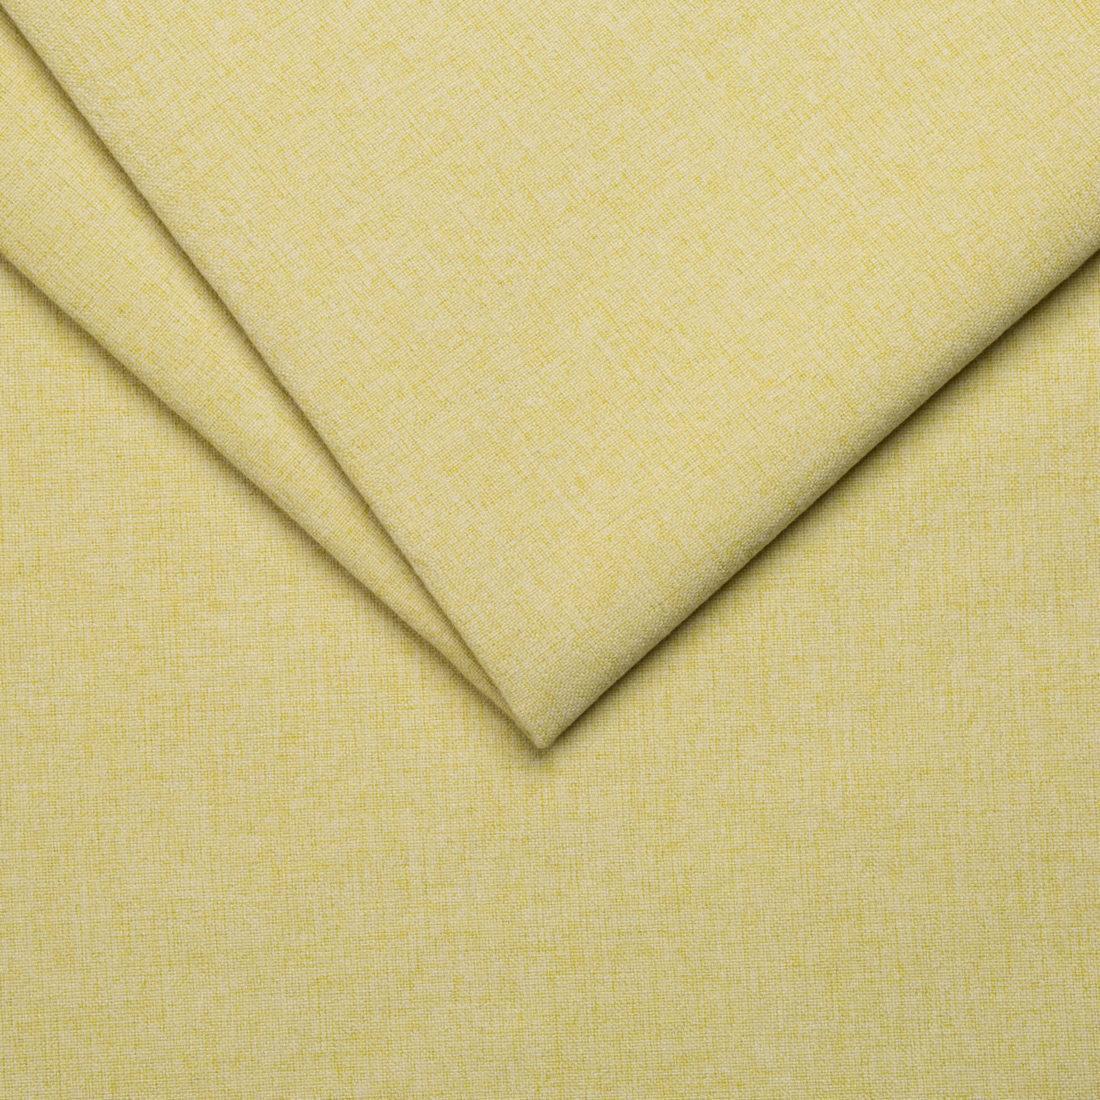 Меблева тканина Cashmere 13 Lemon, рогожка